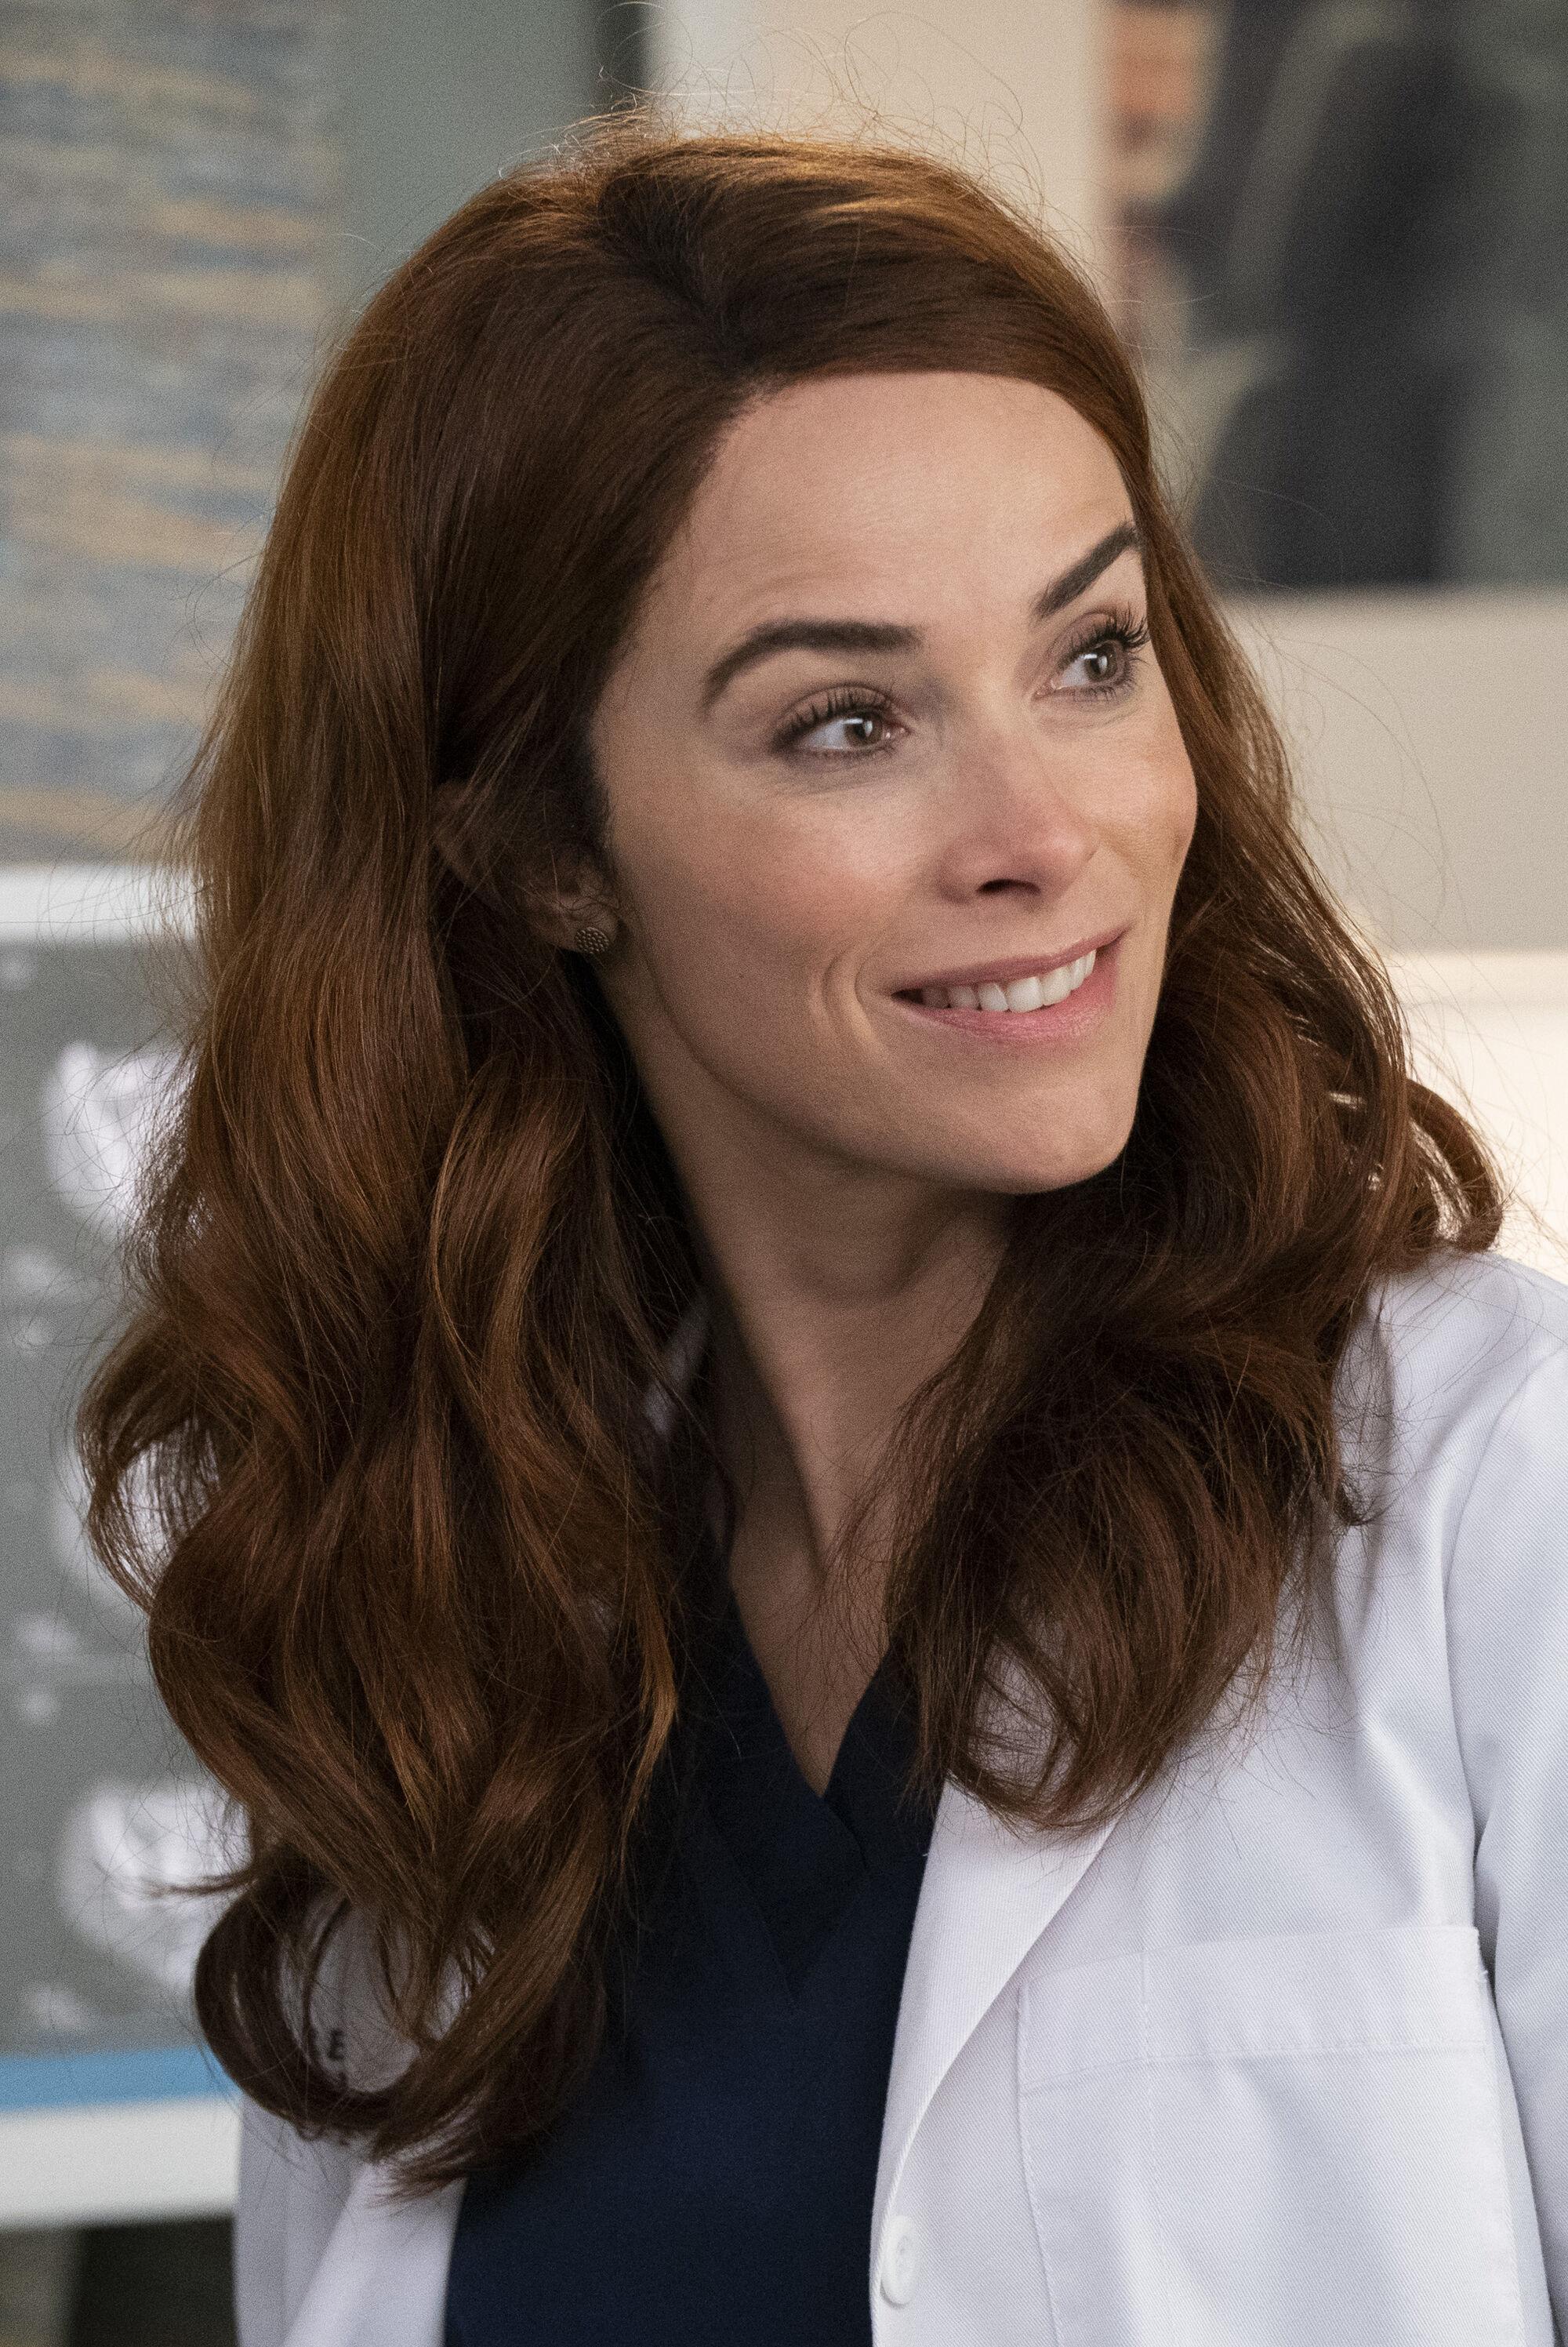 Greys Anatomy Megan